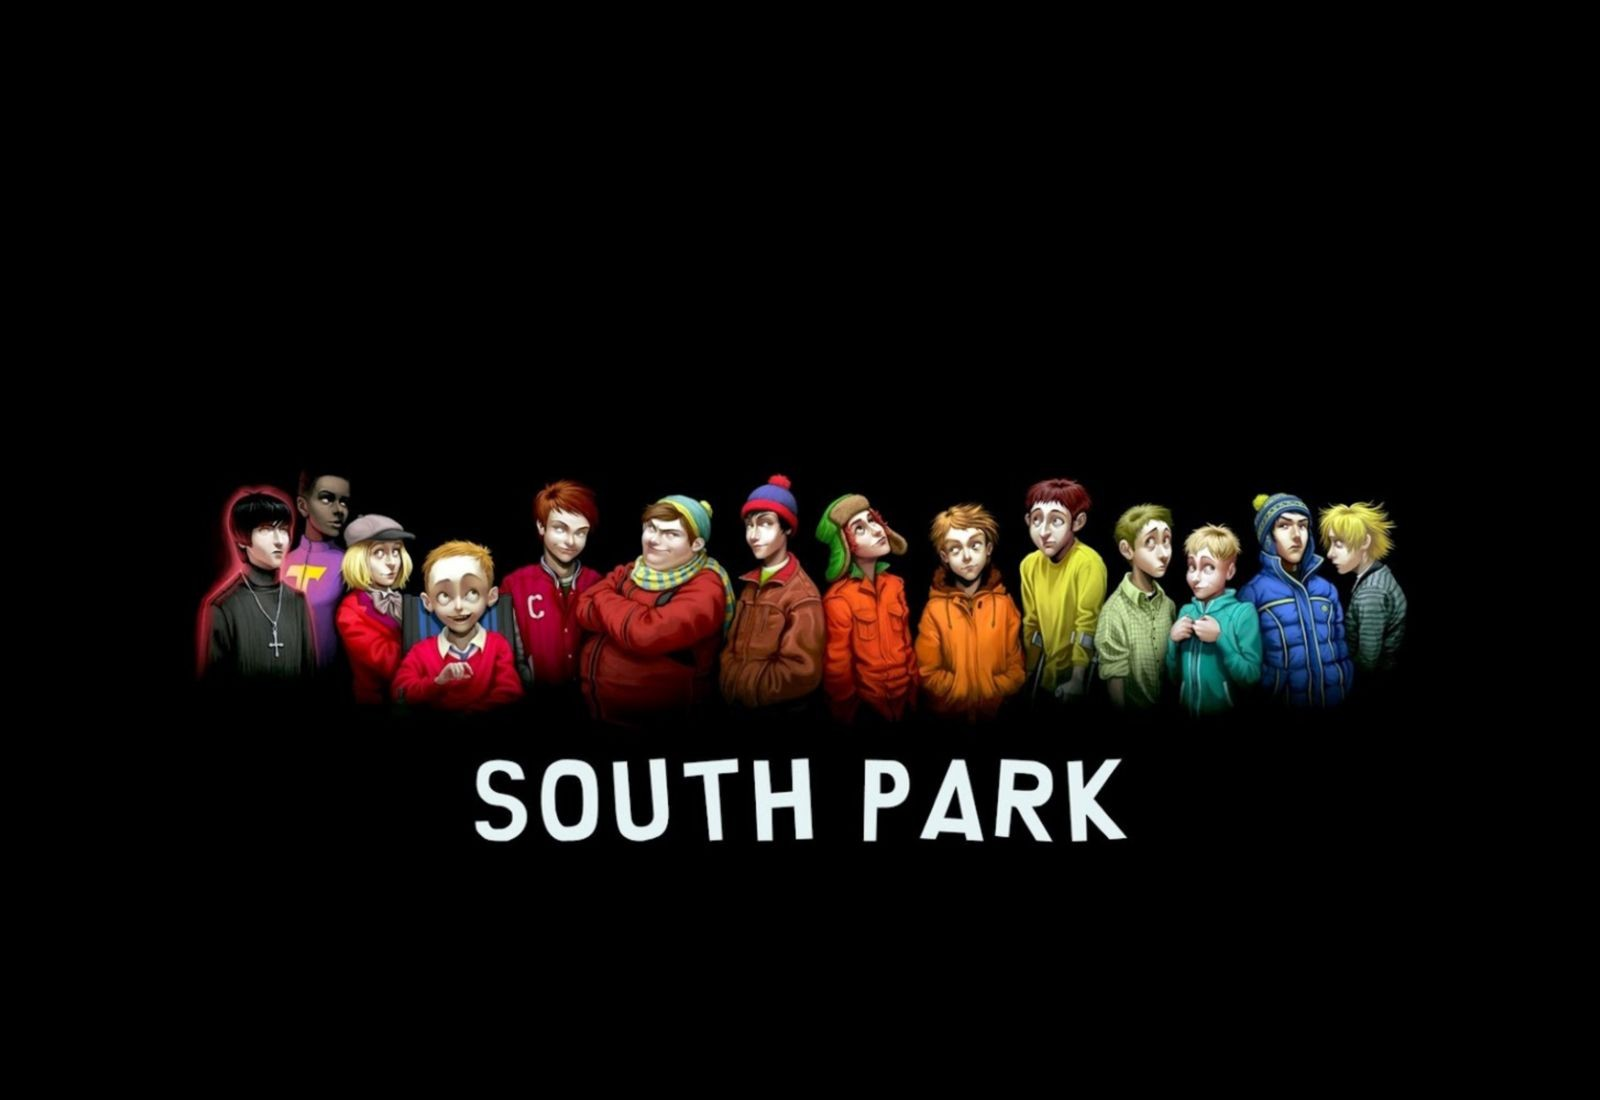 South Park Funny Wallpaper Desktop HD Wallpaper   Download 1600x1100